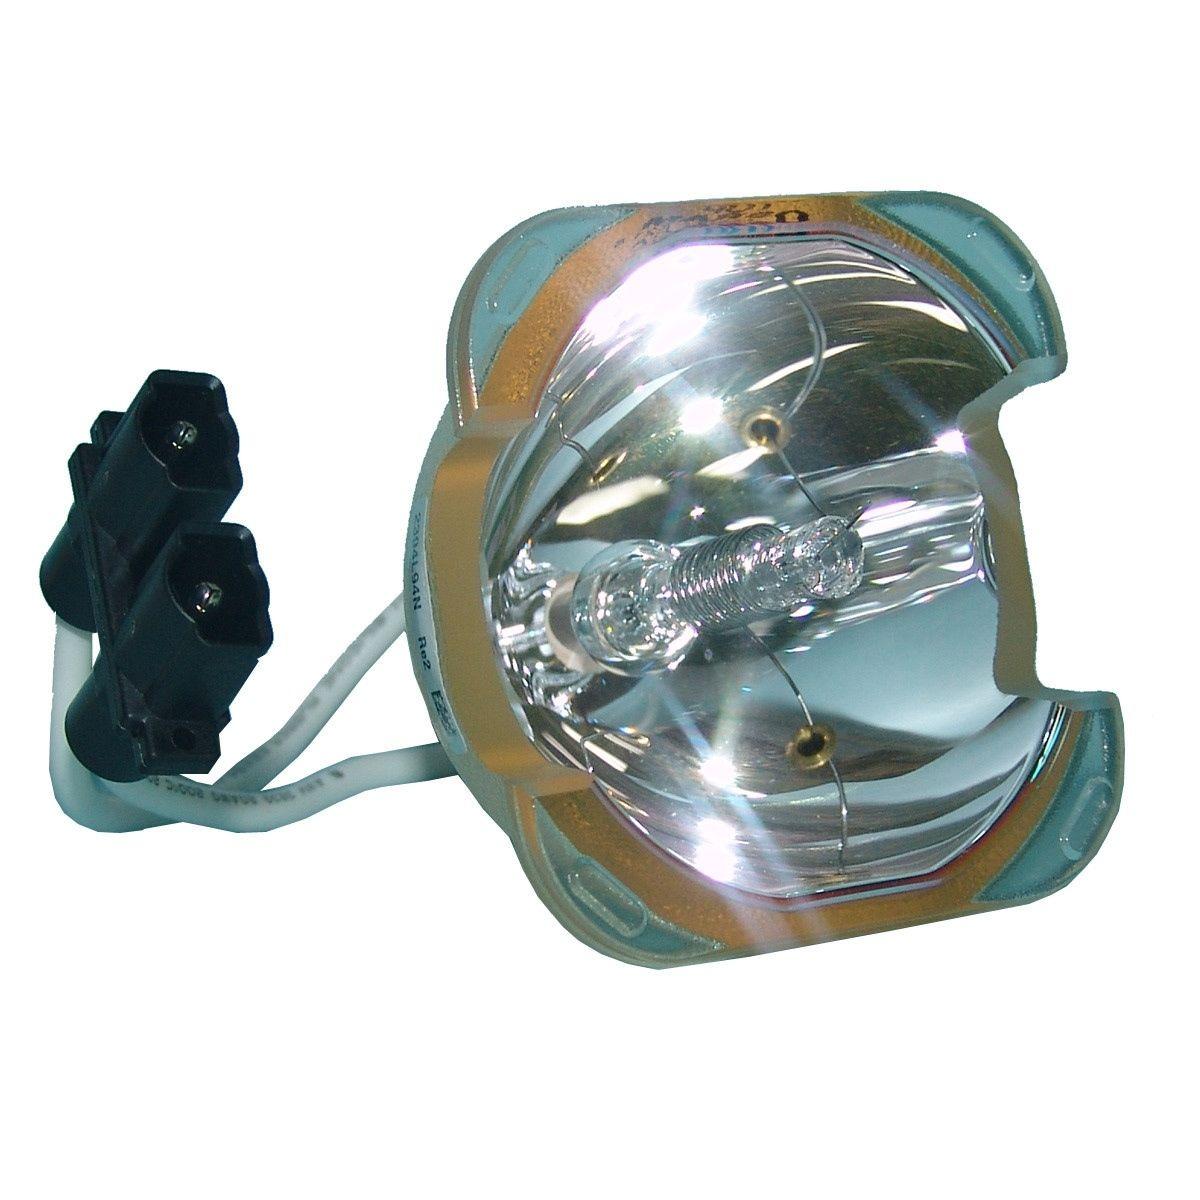 все цены на Compatible Bare Bulb 03-000710-01P for CHRISTIE Matrix 1500 / Vivid DS30 / Vivid DS30W Projector Lamp Bulb without housing онлайн